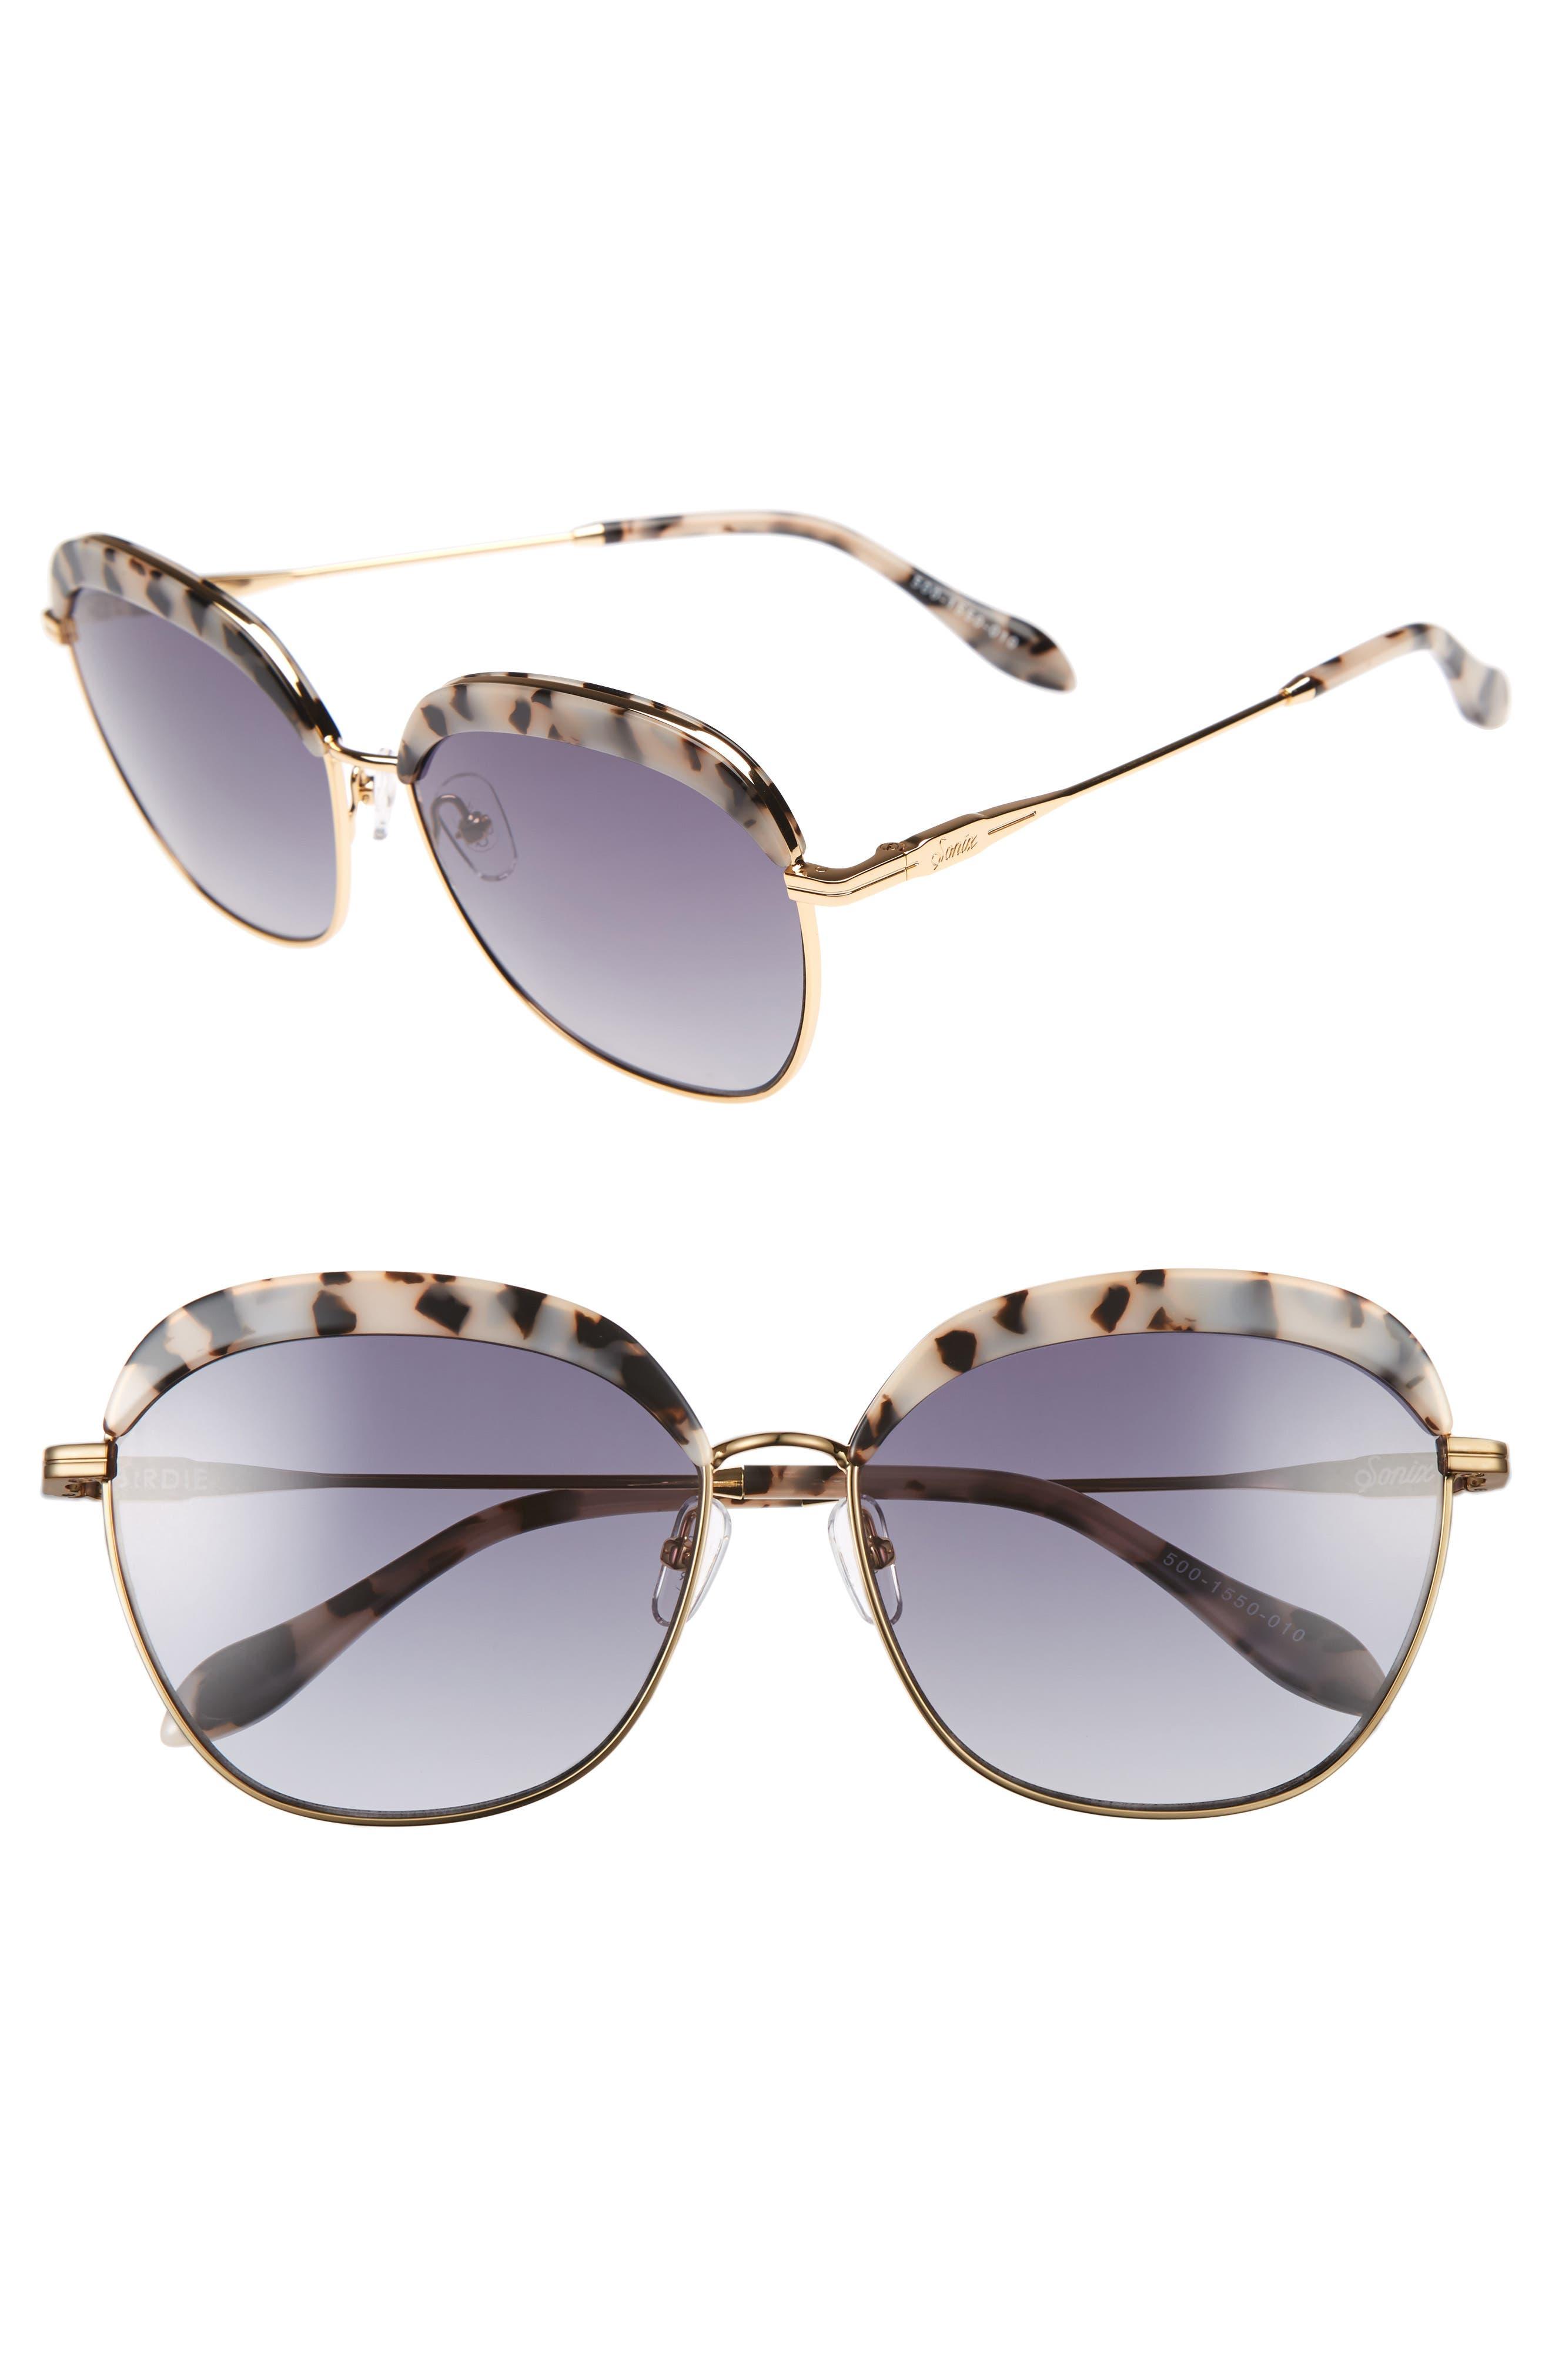 Sonix Birdie 60mm Oversize Sunglasses